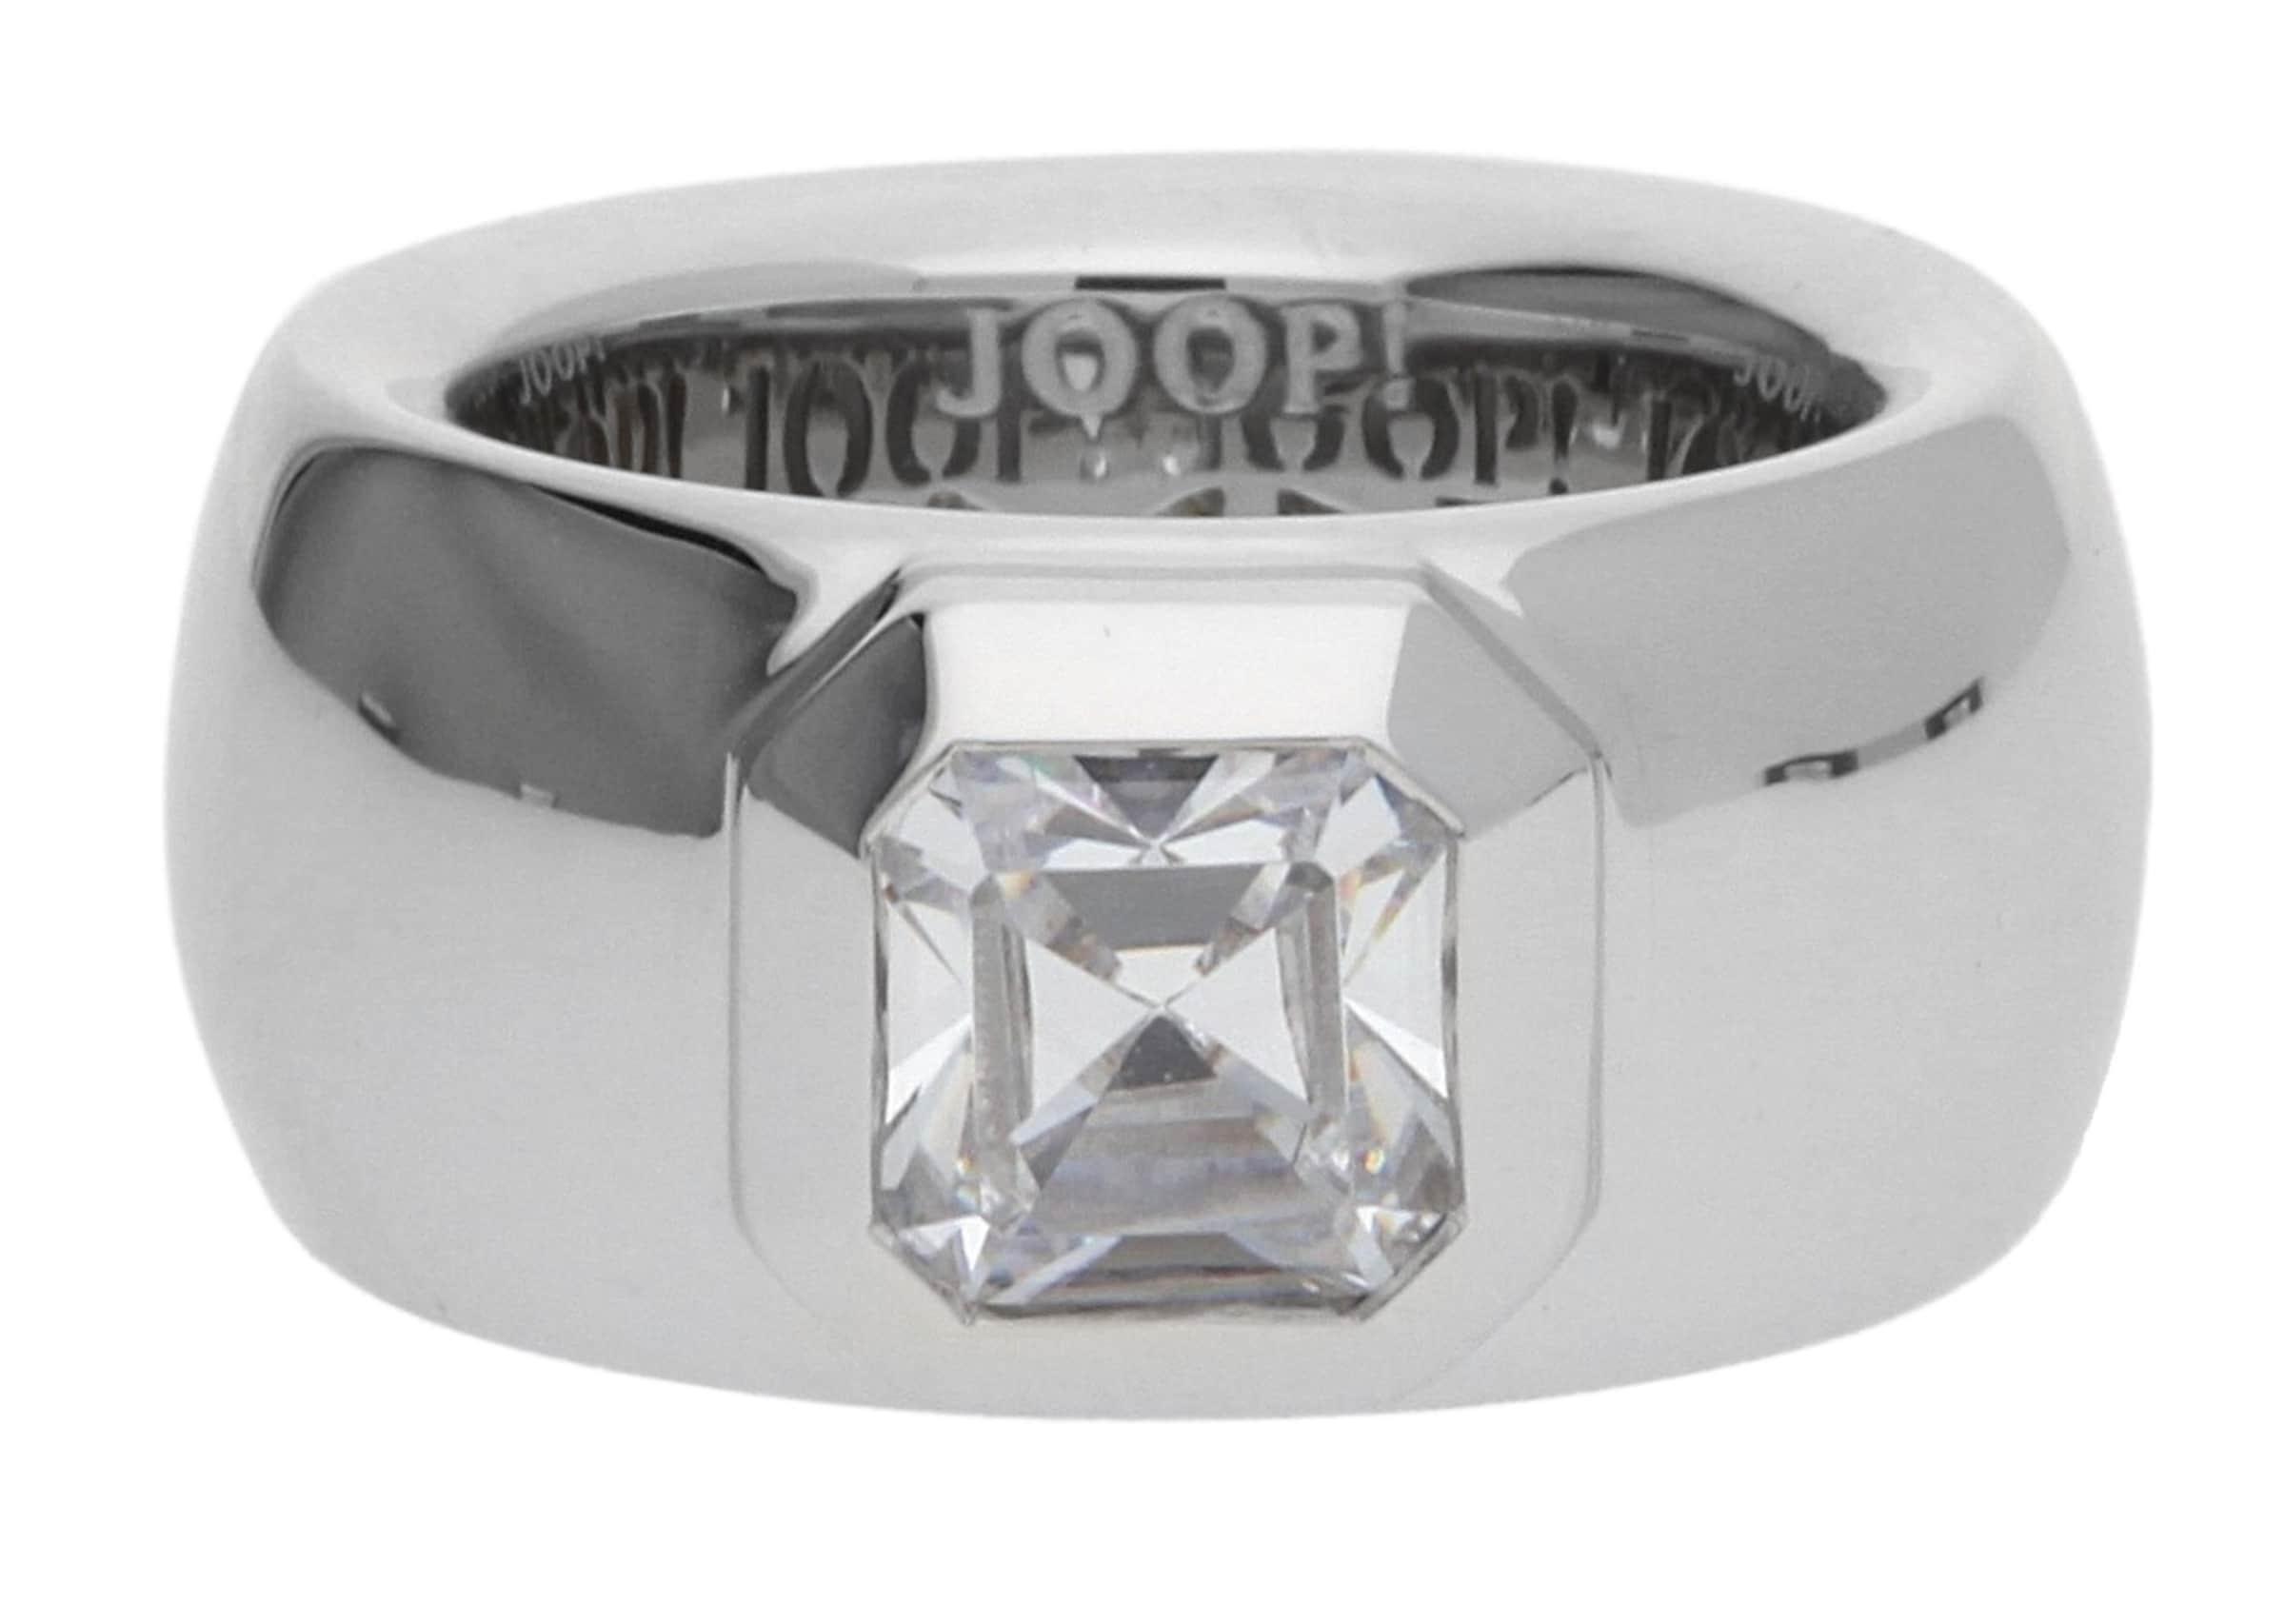 JOOP! Damen Fingerring Silber Keria JPRG90684A Komfortabel Zu Verkaufen Rabatt Wirklich Webseite Günstiger Preis jvgrqyVup